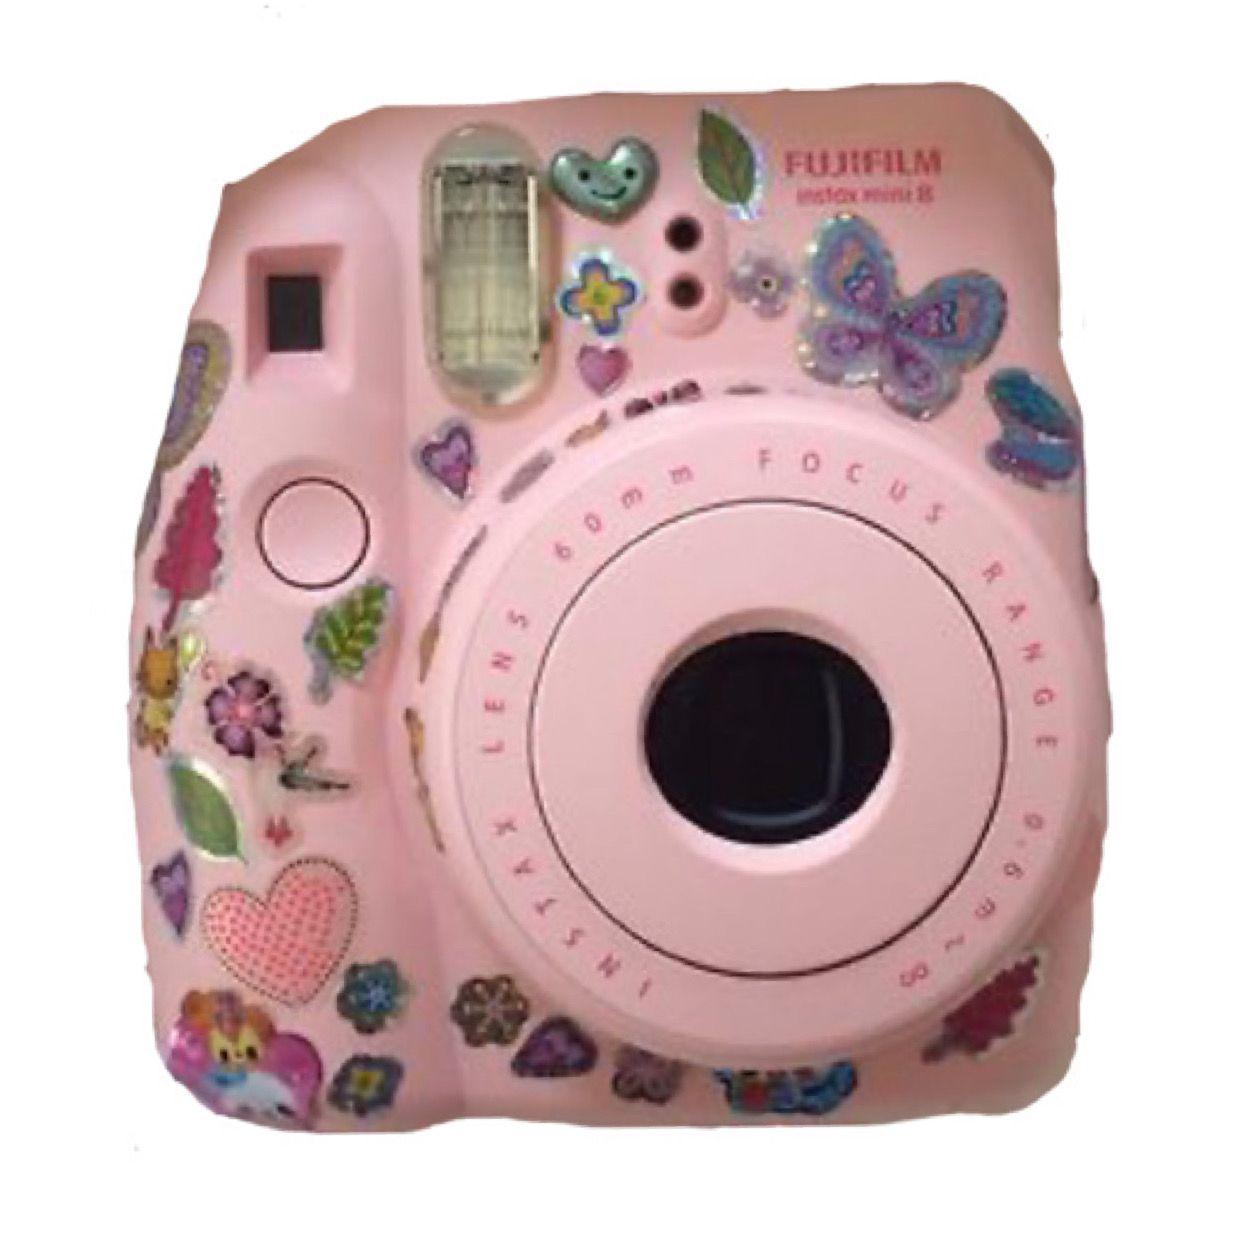 Polaroid Camera Png Polaroid Camera Fujifilm Instax Mini Camera